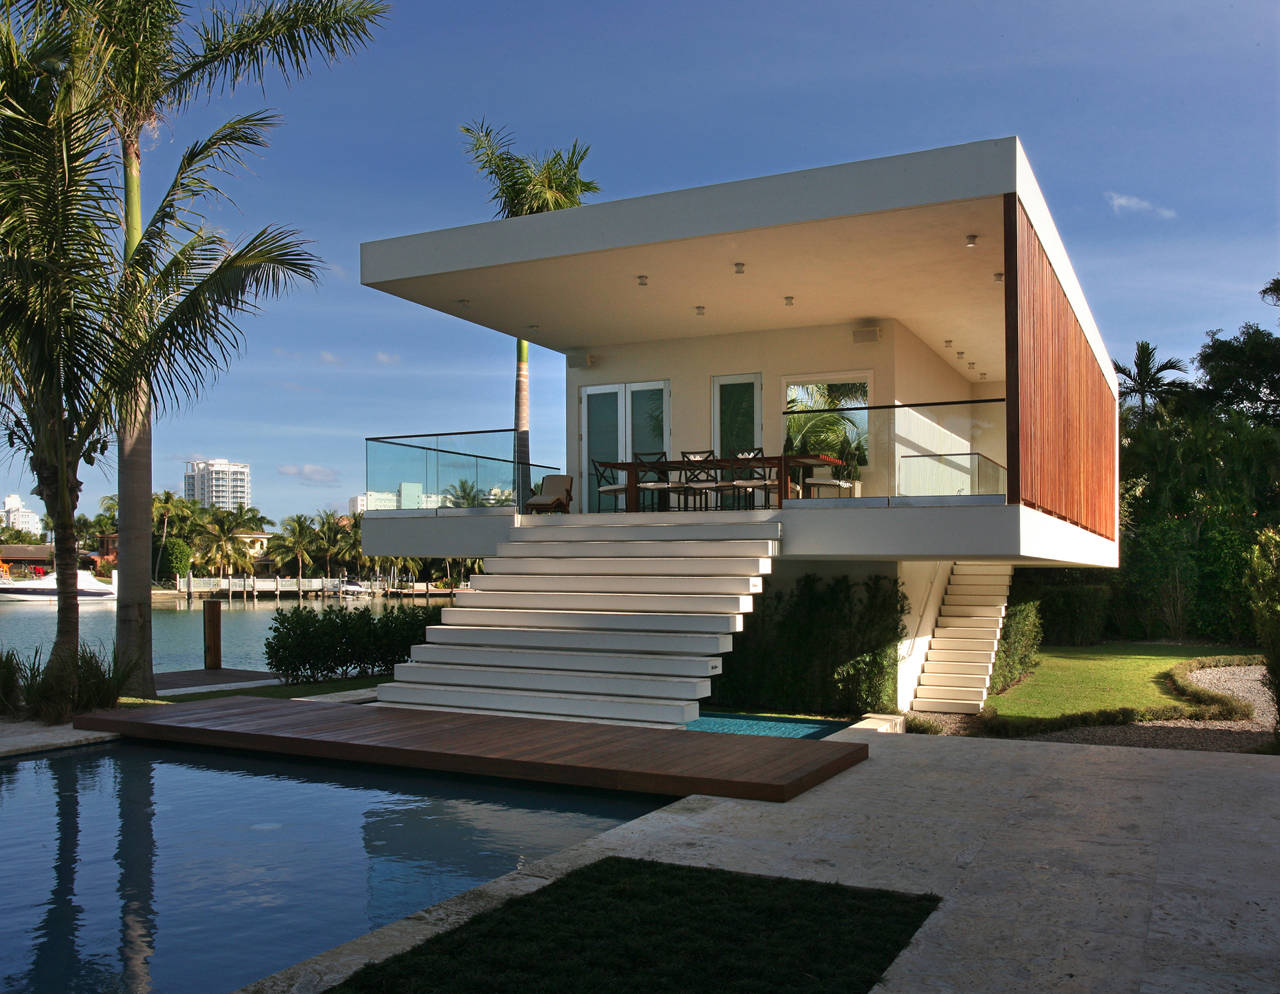 La Gorce Island Miami Beach Address